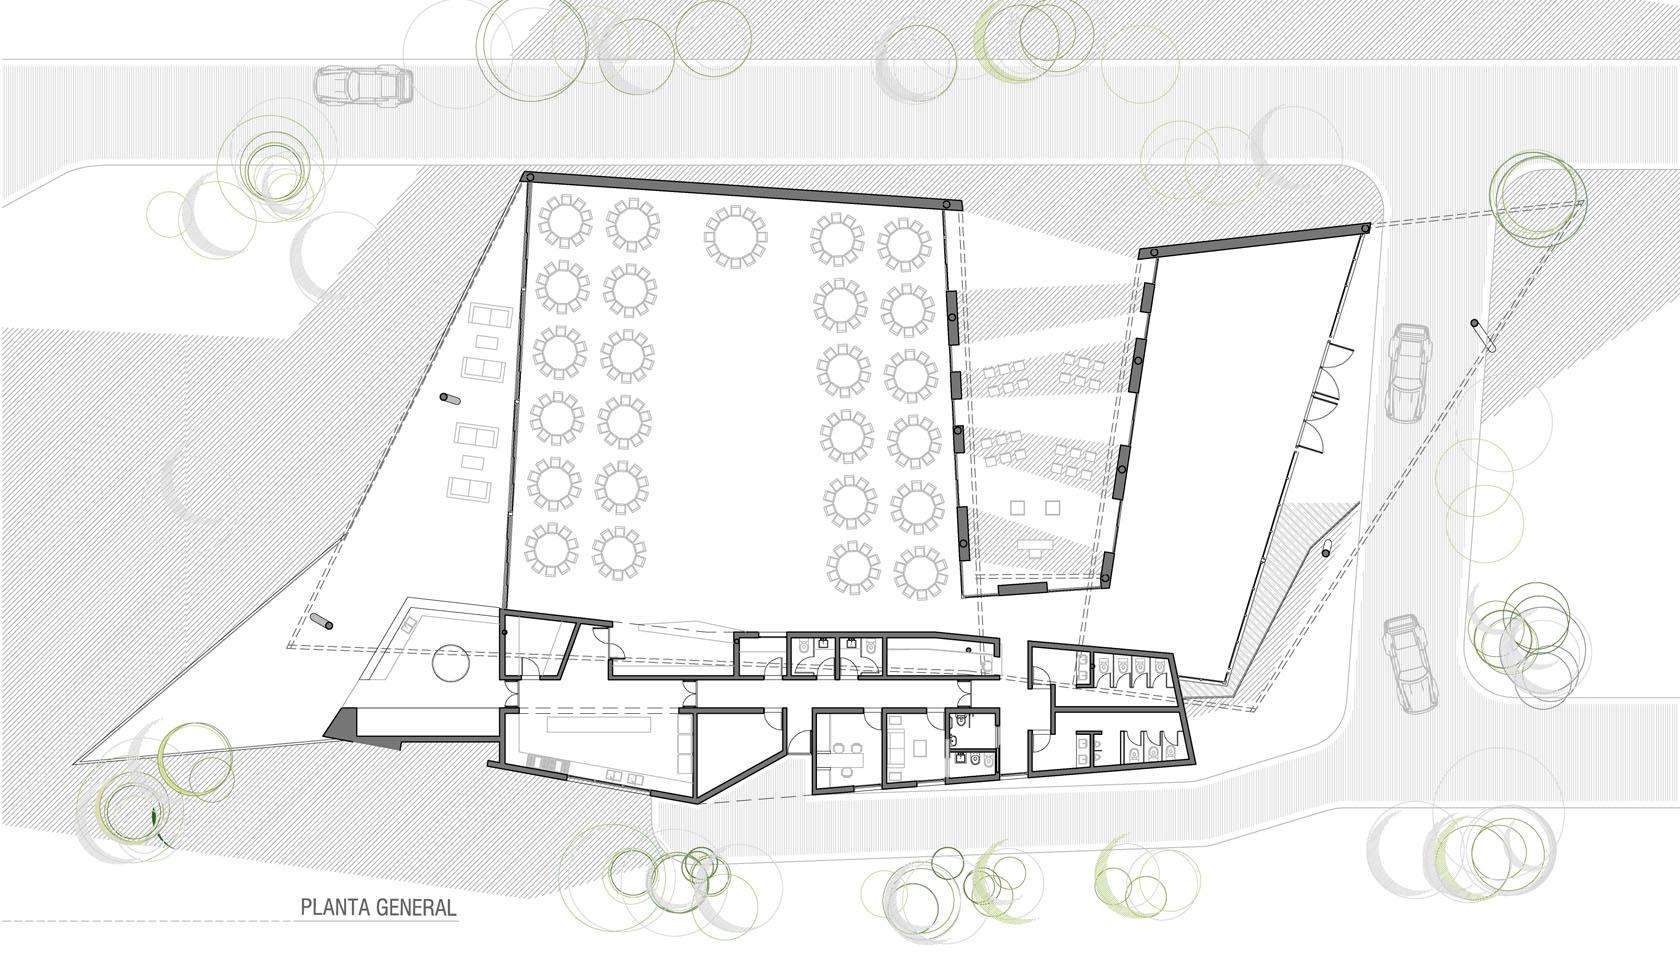 Plantas de edifico modernos, plantas de arquitectura contemporánea